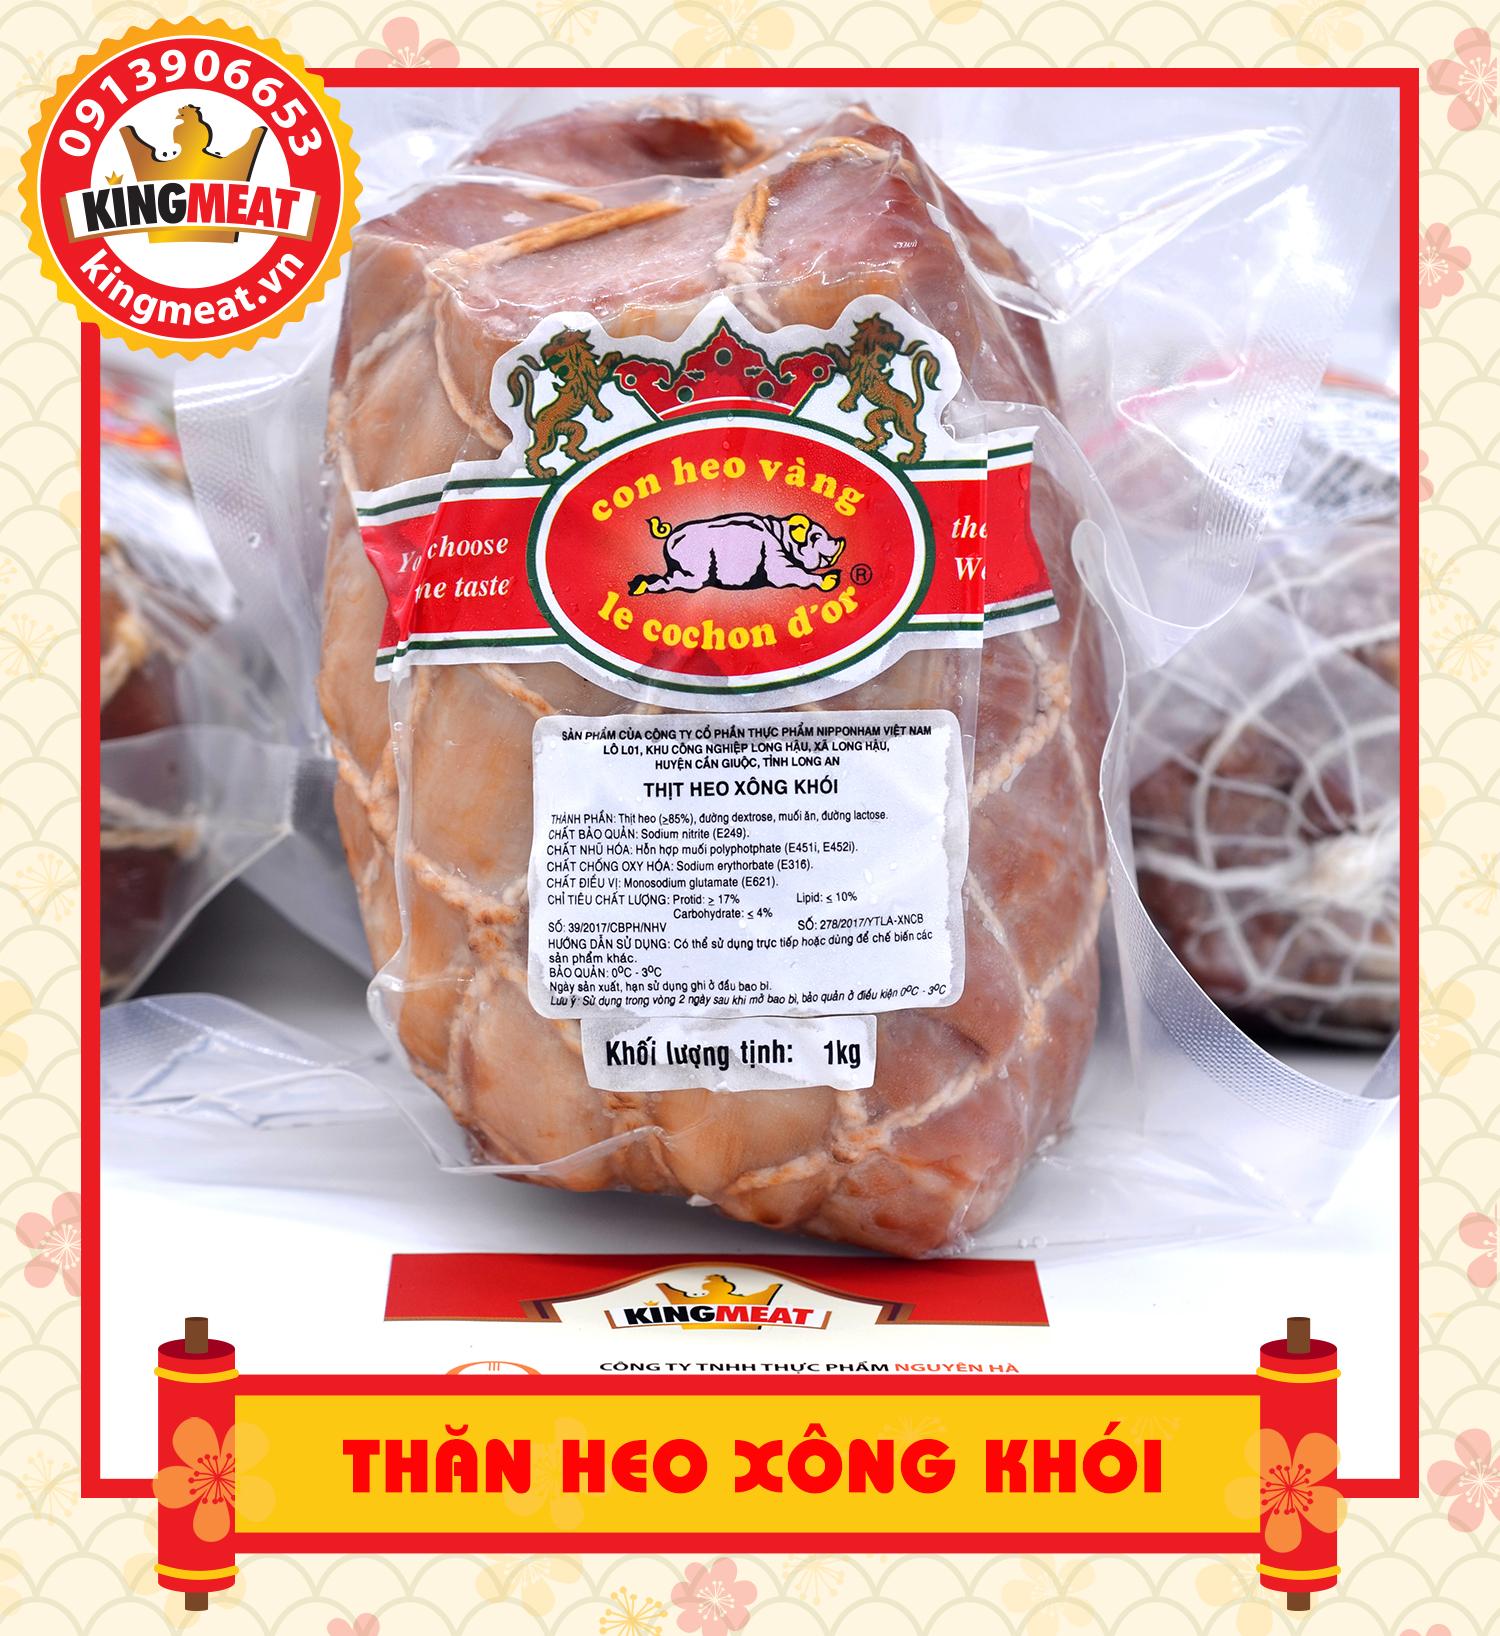 Than-heo-xong-khoi